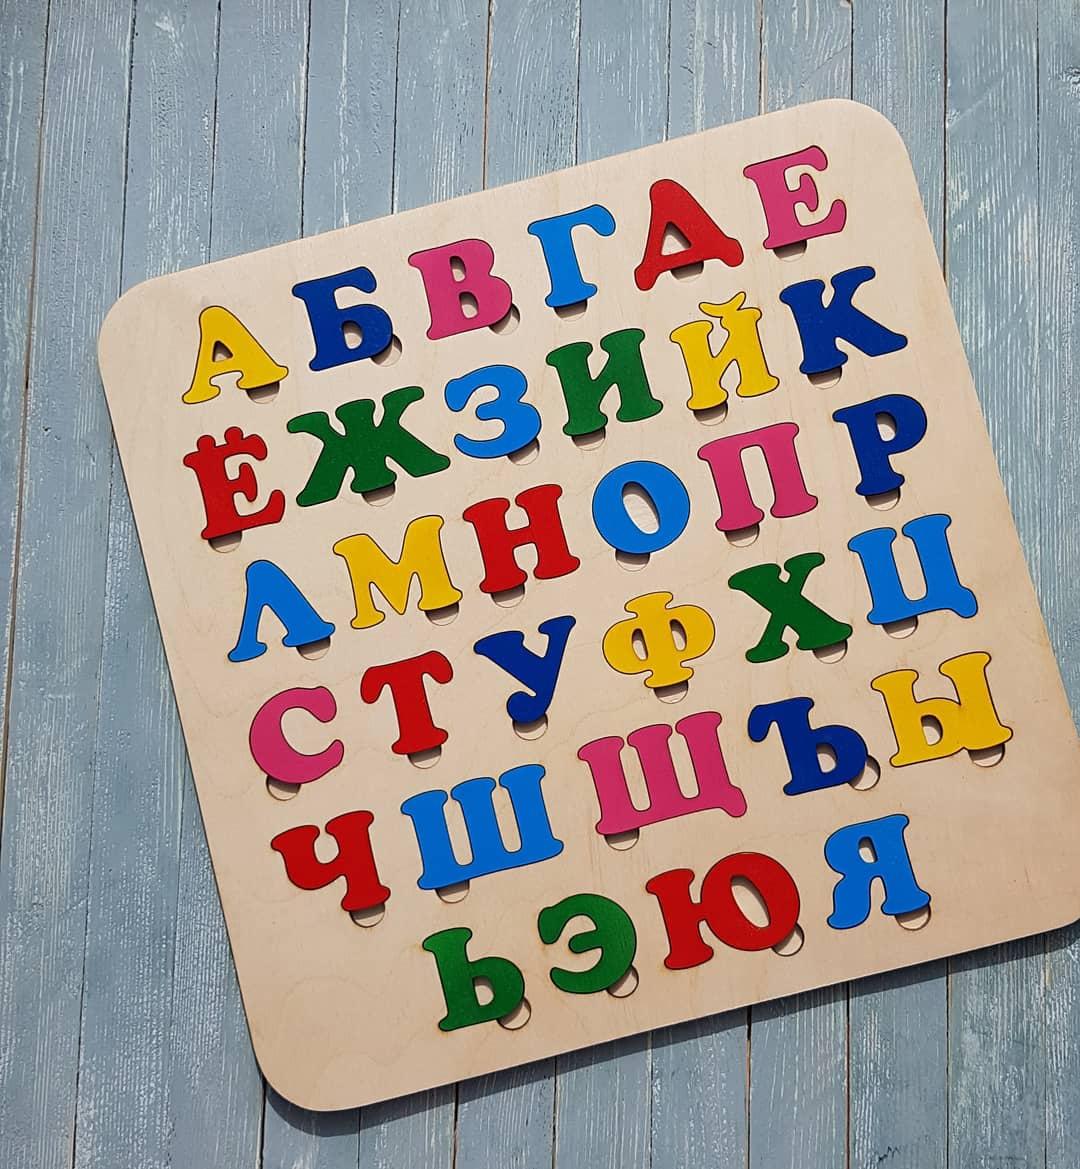 Laser Cut Russian Alphabet Wooden Puzzle Free Vector